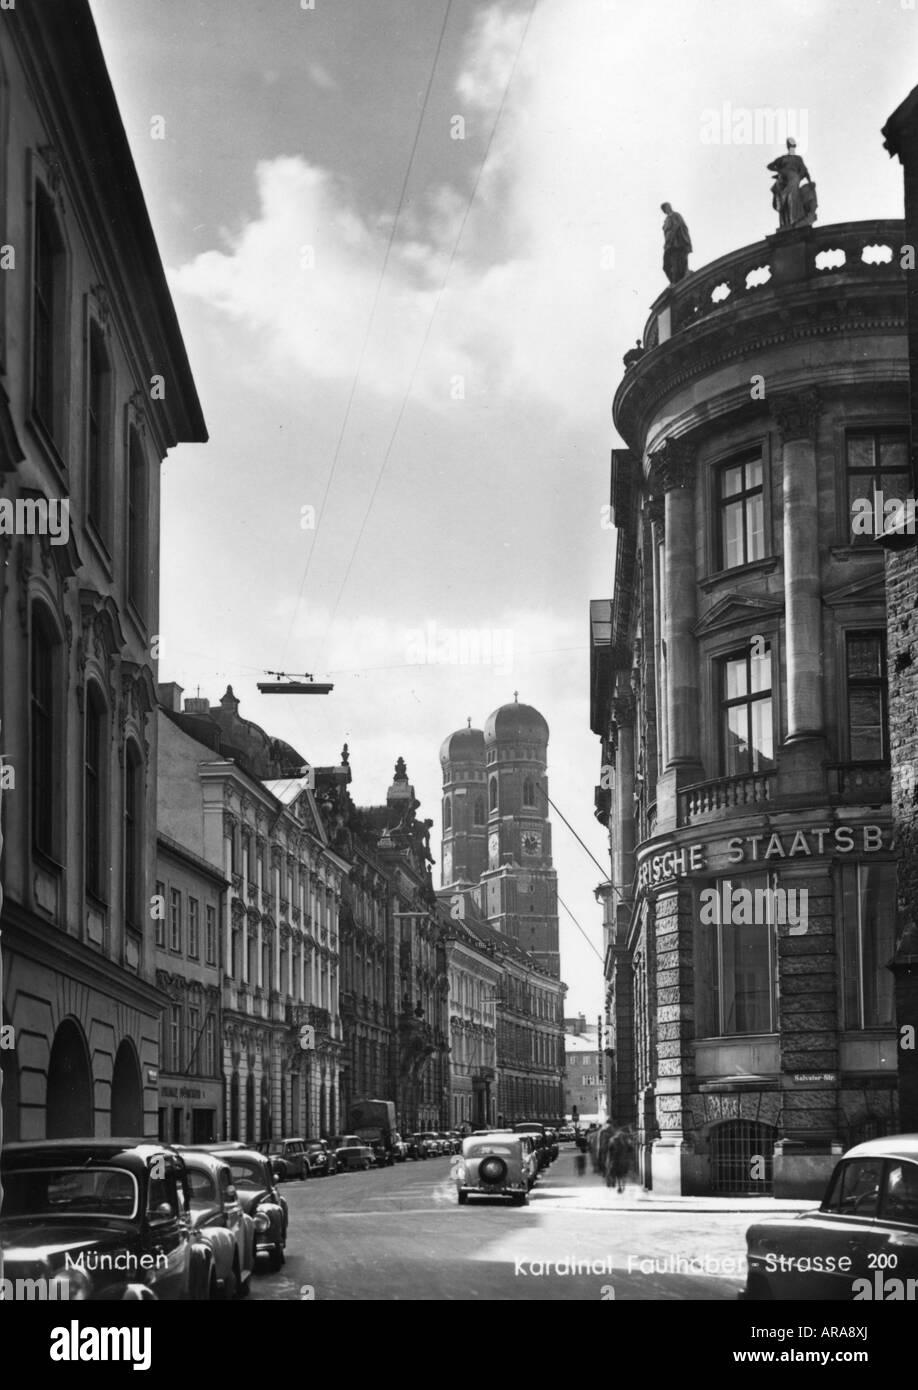 geography/travel, Germany, Munich, Kardinal-Faulhaber-Strasse, view, postcard, Zannantonio, 1950s, Stock Photo